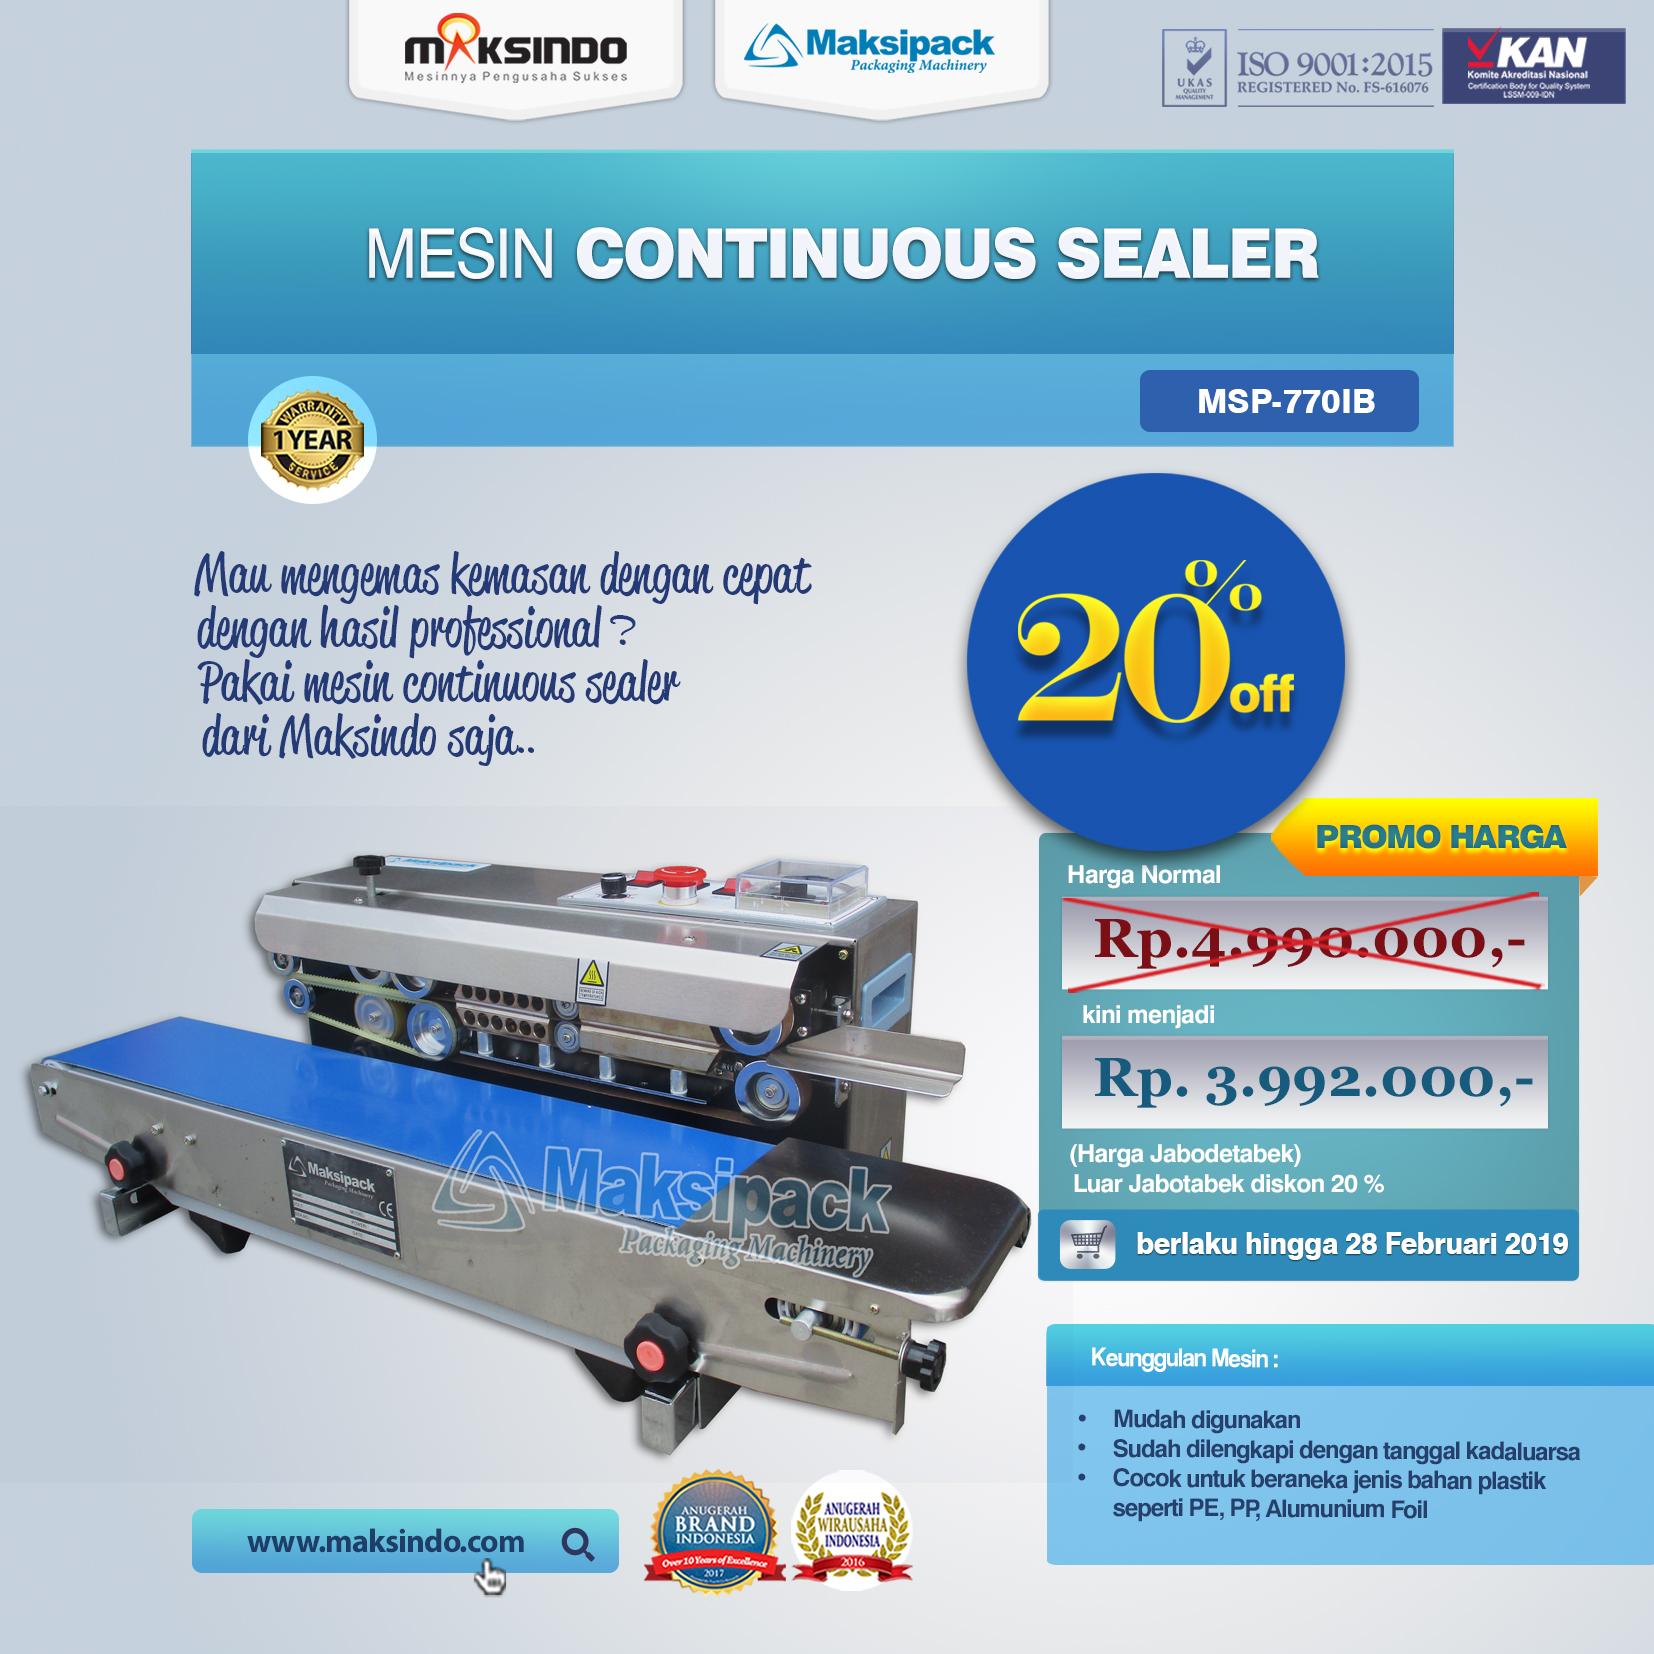 MSP-770IB Mesin Continuous Sealer